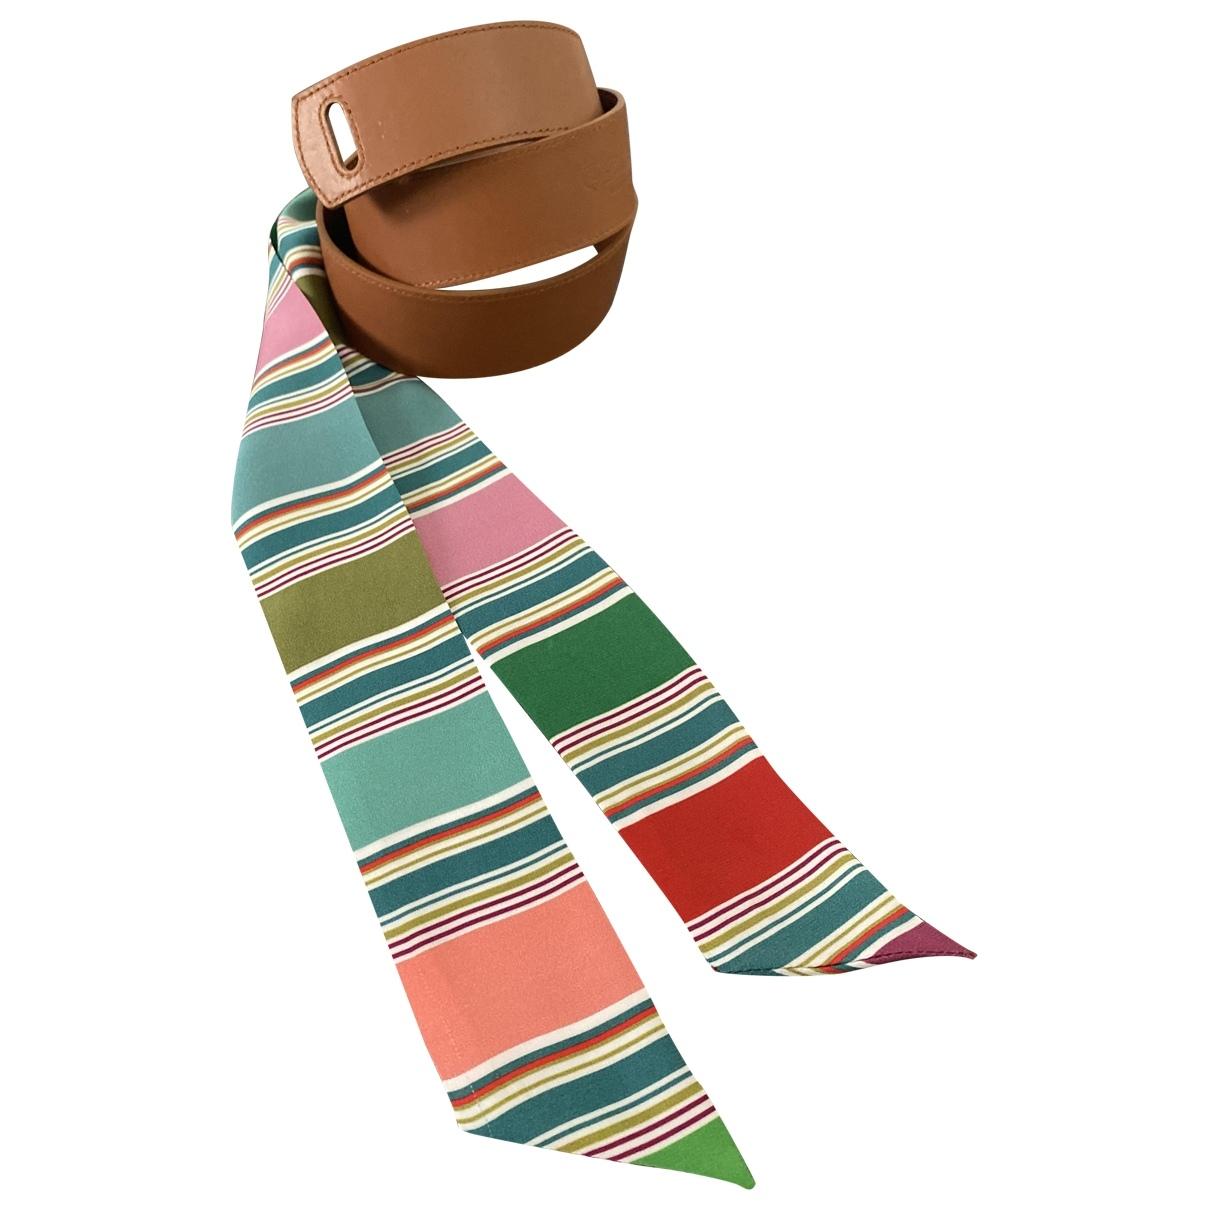 Loro Piana \N Brown Leather belt for Women S International